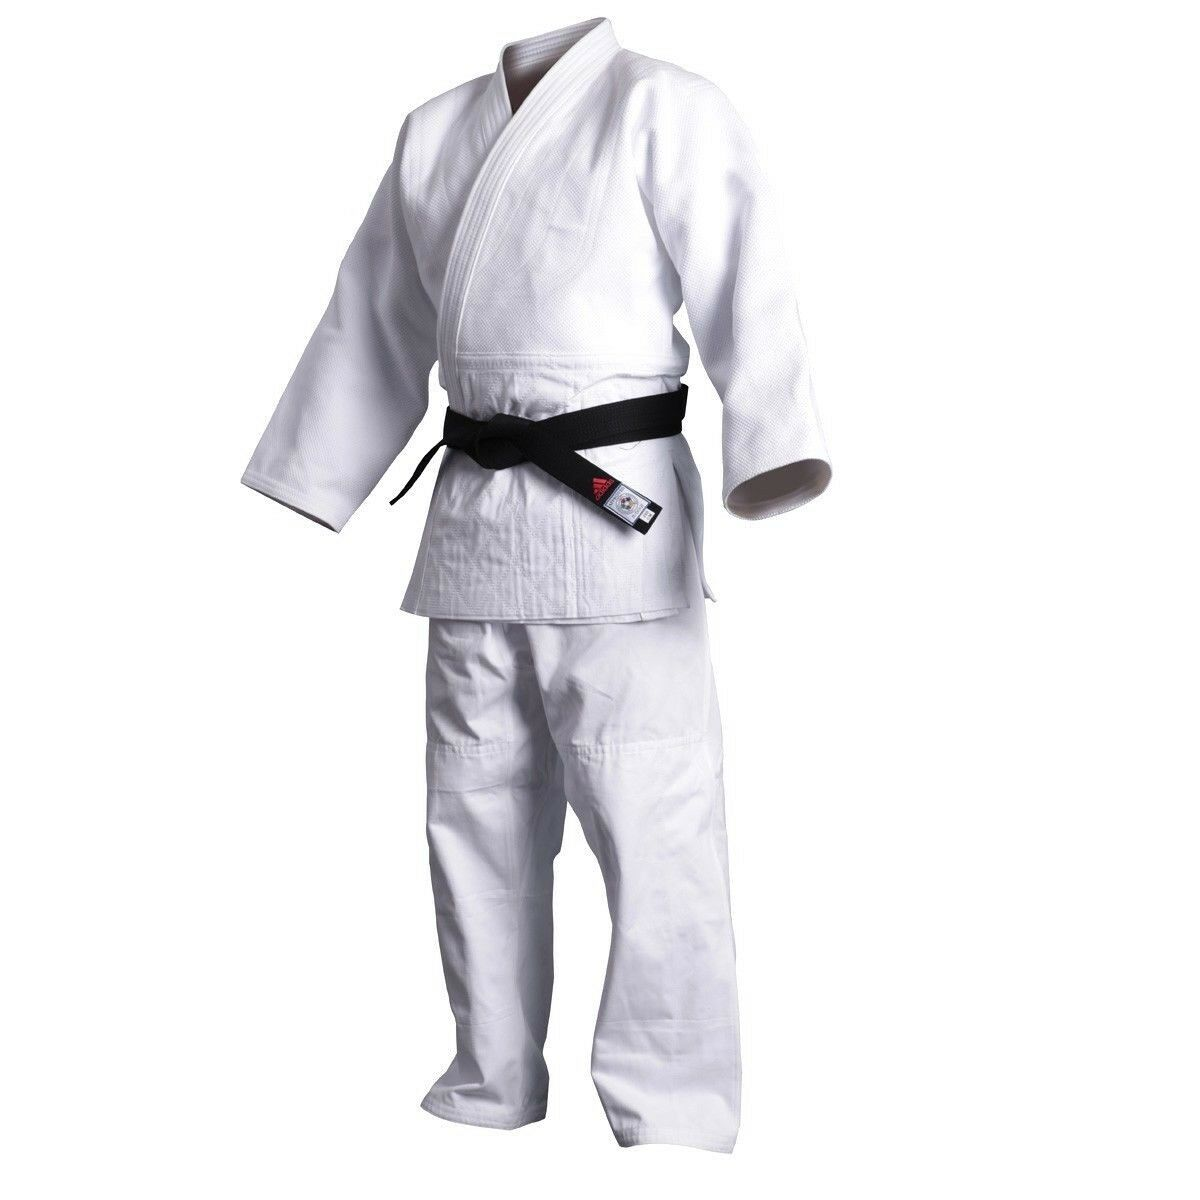 New adidas Judo Training  White Gi Uniform Single Weave 100% Cotton-J500  cheapest